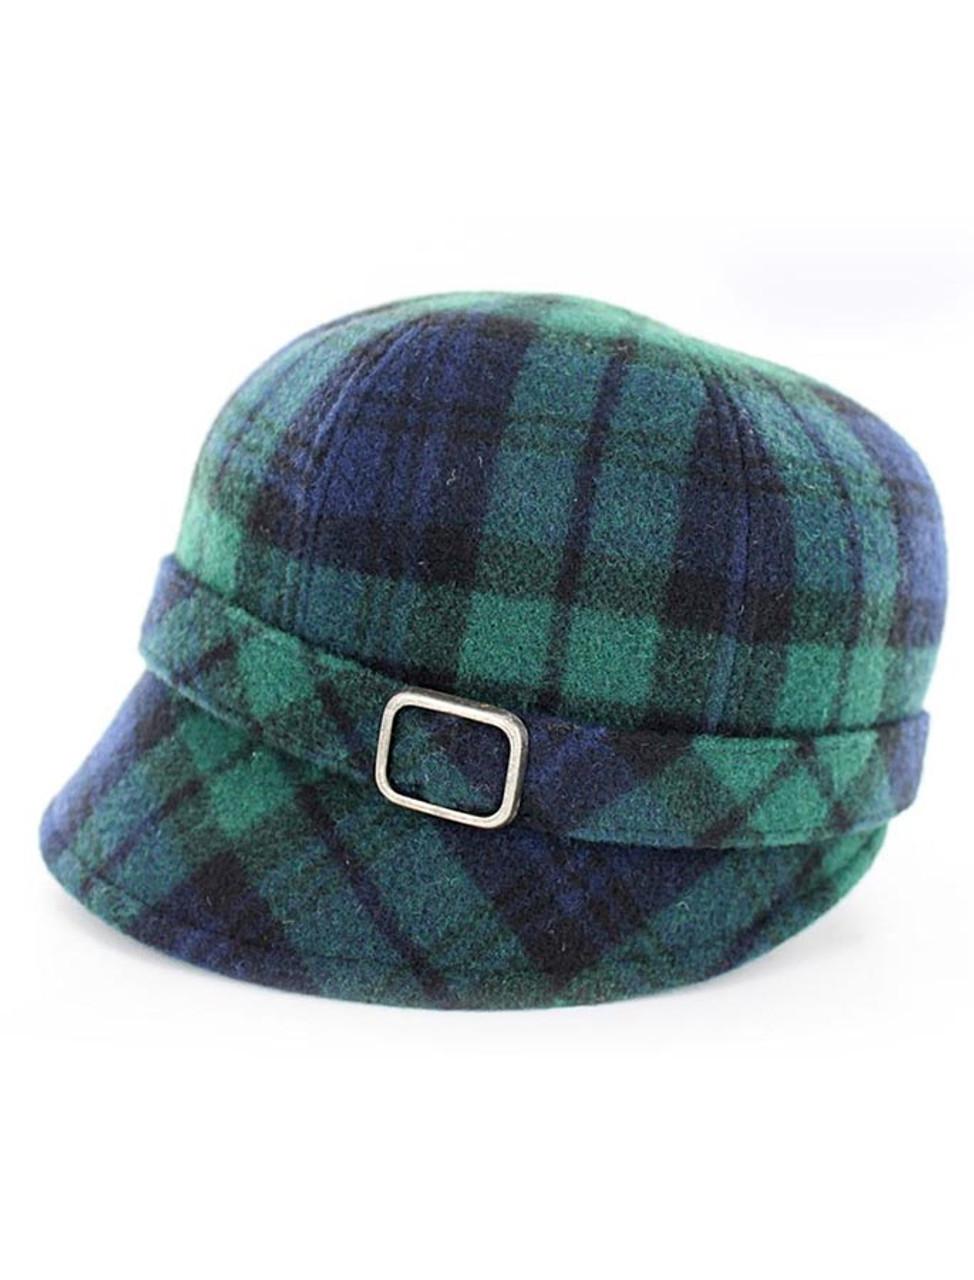 Ladies Tweed Flapper Cap - Blackwatch  1b443b413f3